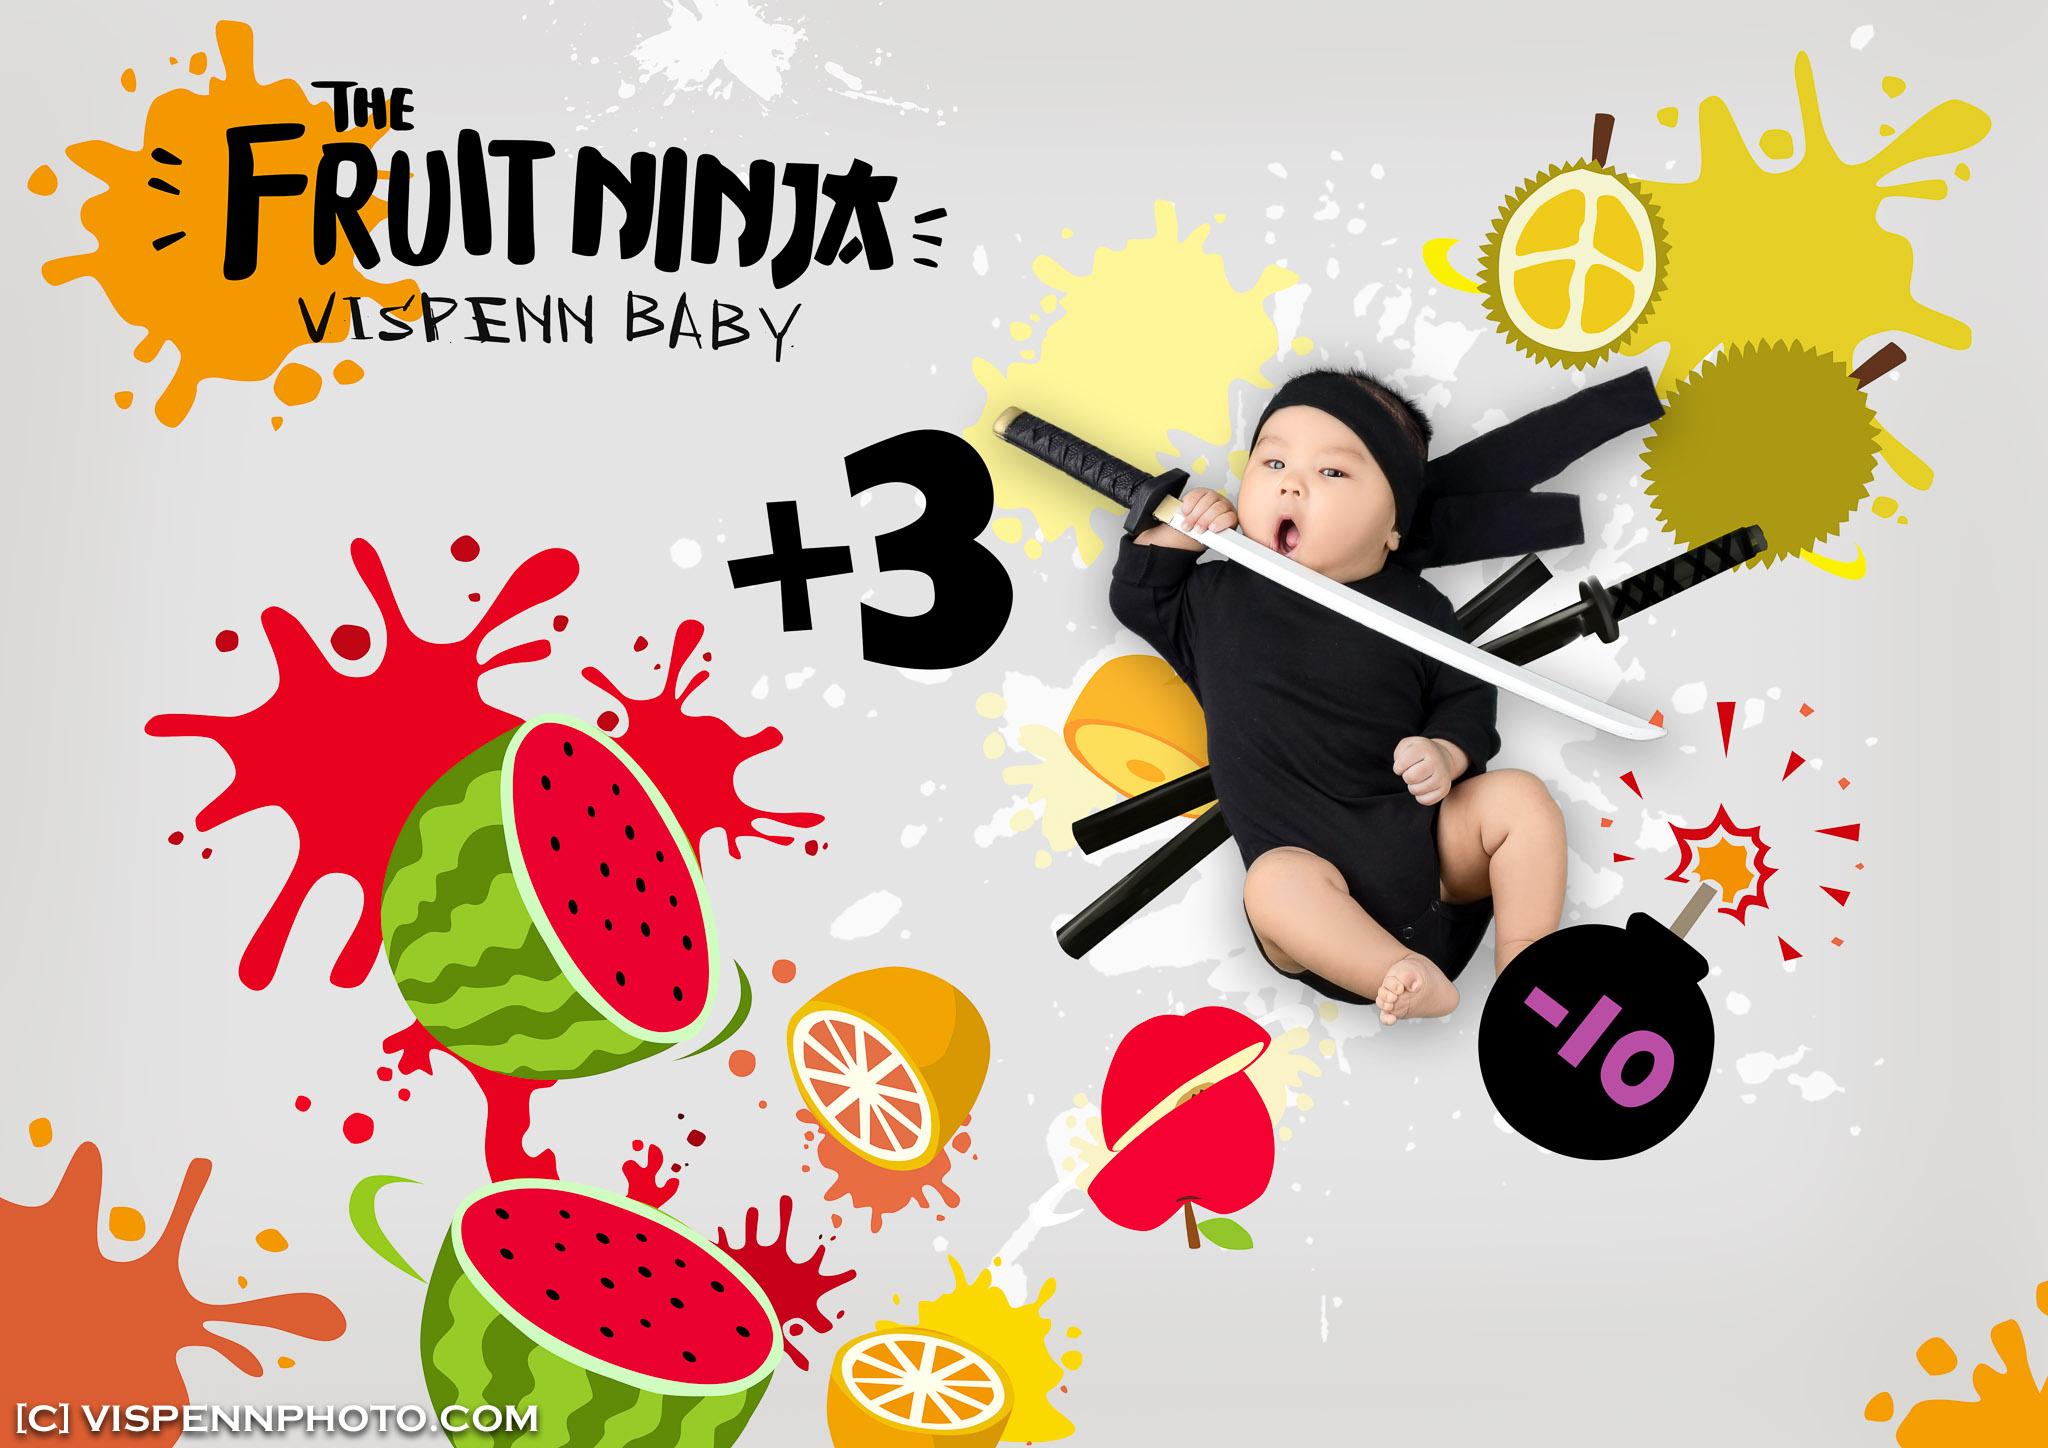 Melbourne Newborn Baby Family Photo BaoBao VISPENN 墨尔本 儿童 宝宝 百天照 满月照 孕妇照 全家福 100DAYS VISPENN StephanieChen 2548